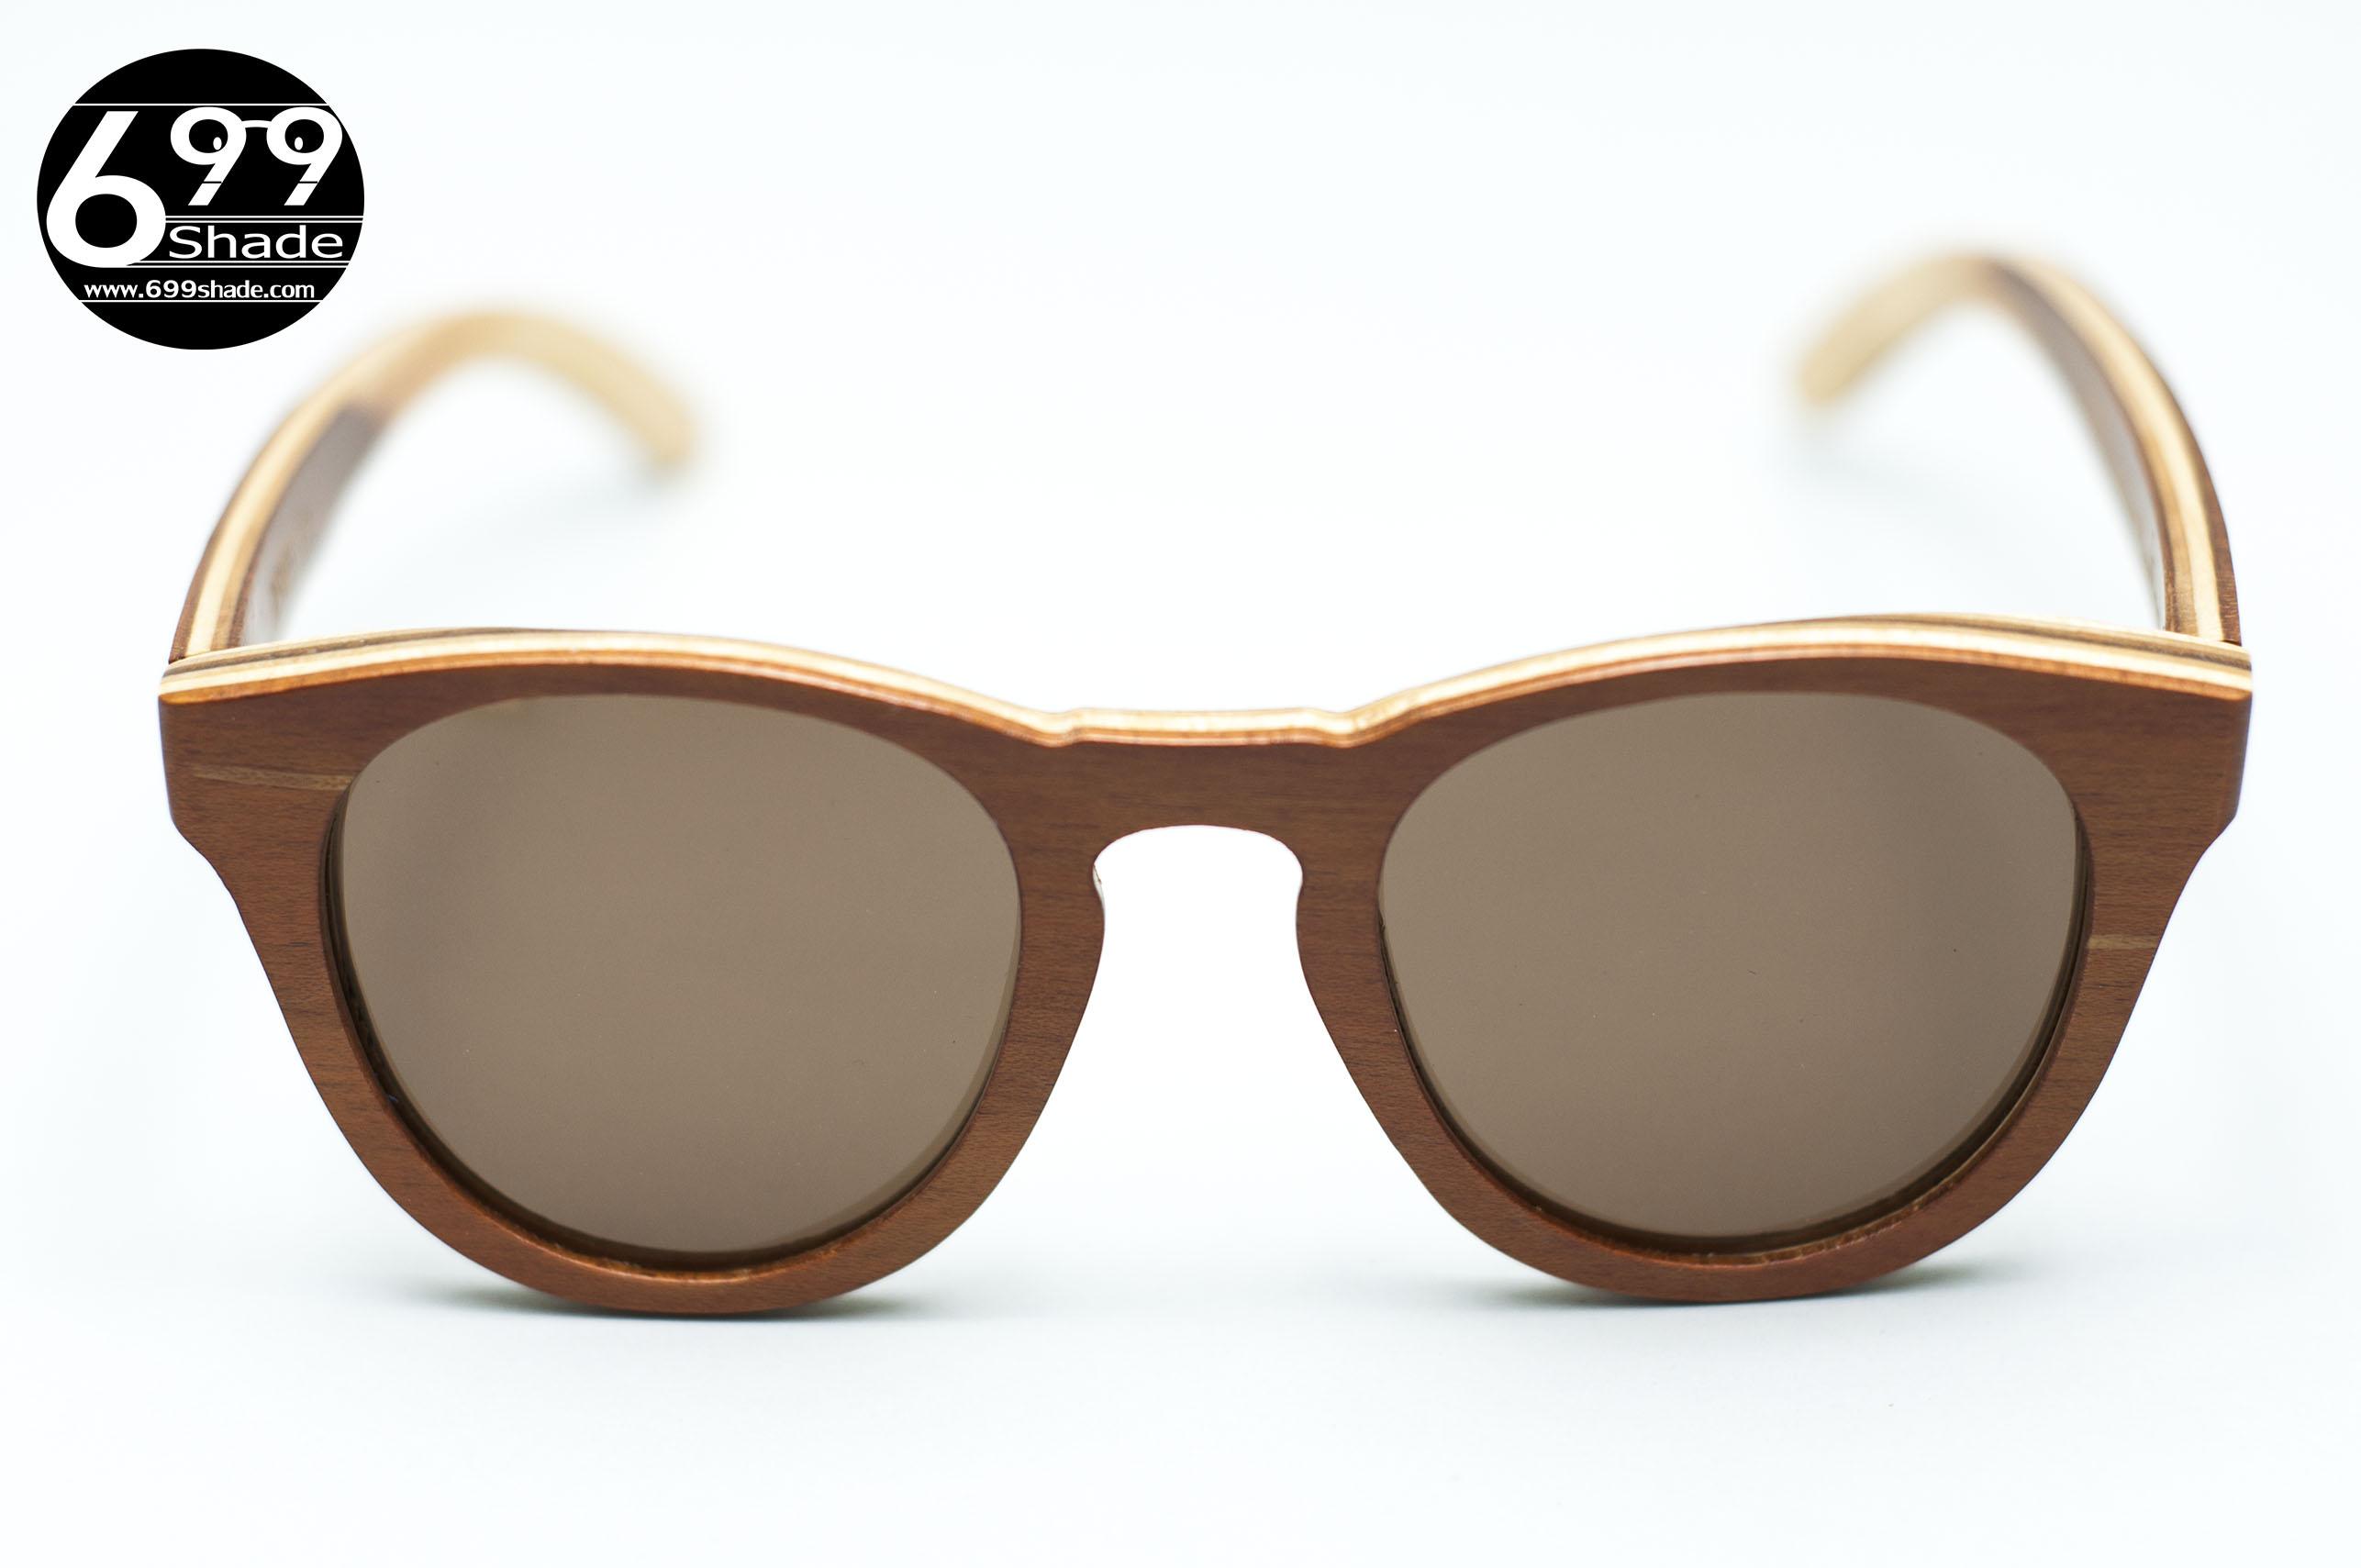 BoardFrame แว่นกันแดด ไม้ skateboard รุ่น 855